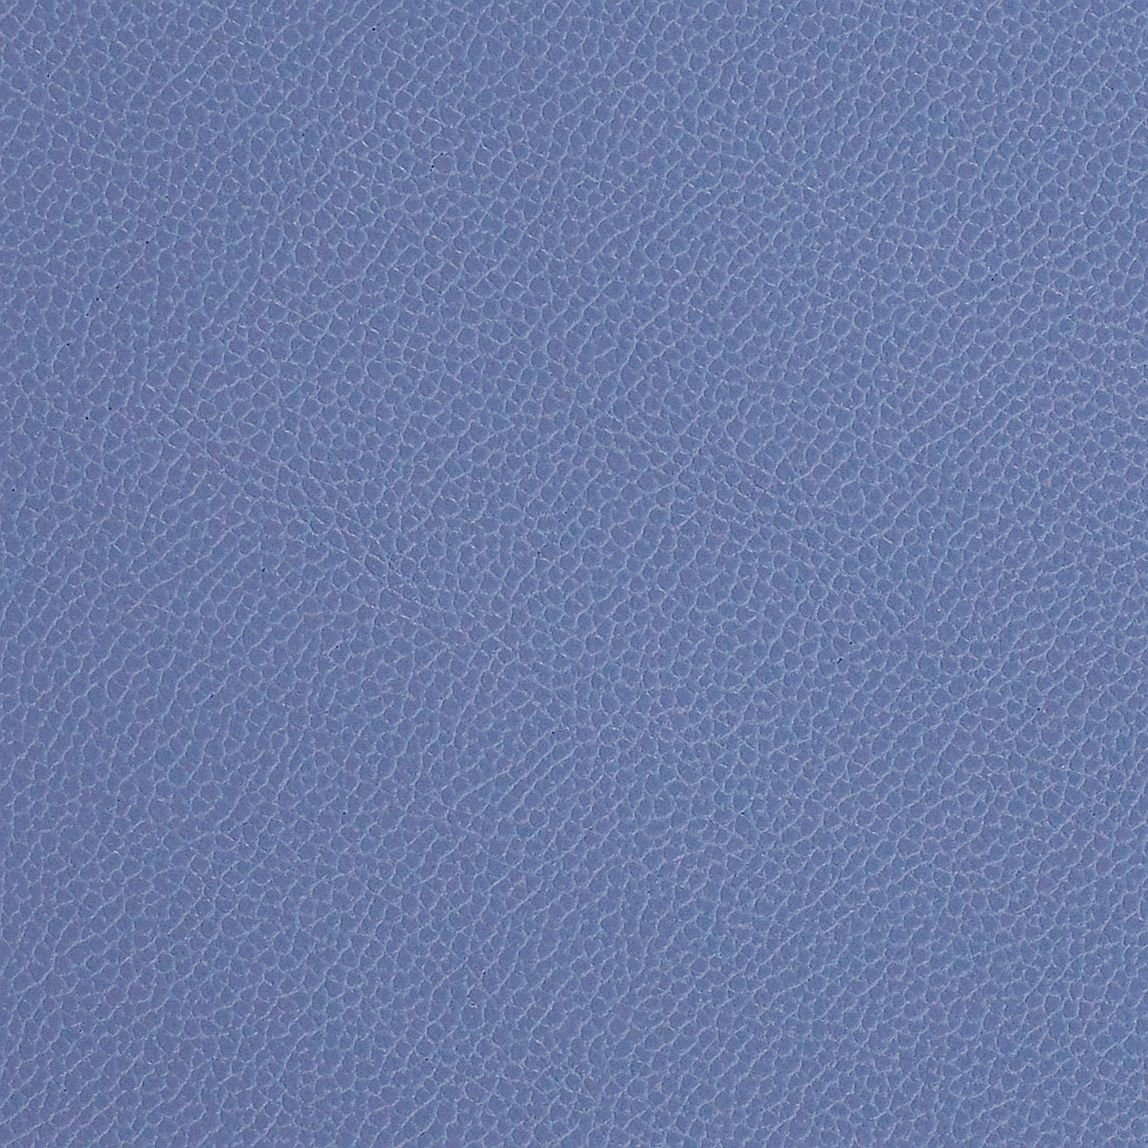 Silica Leather Hyacinth Swatch